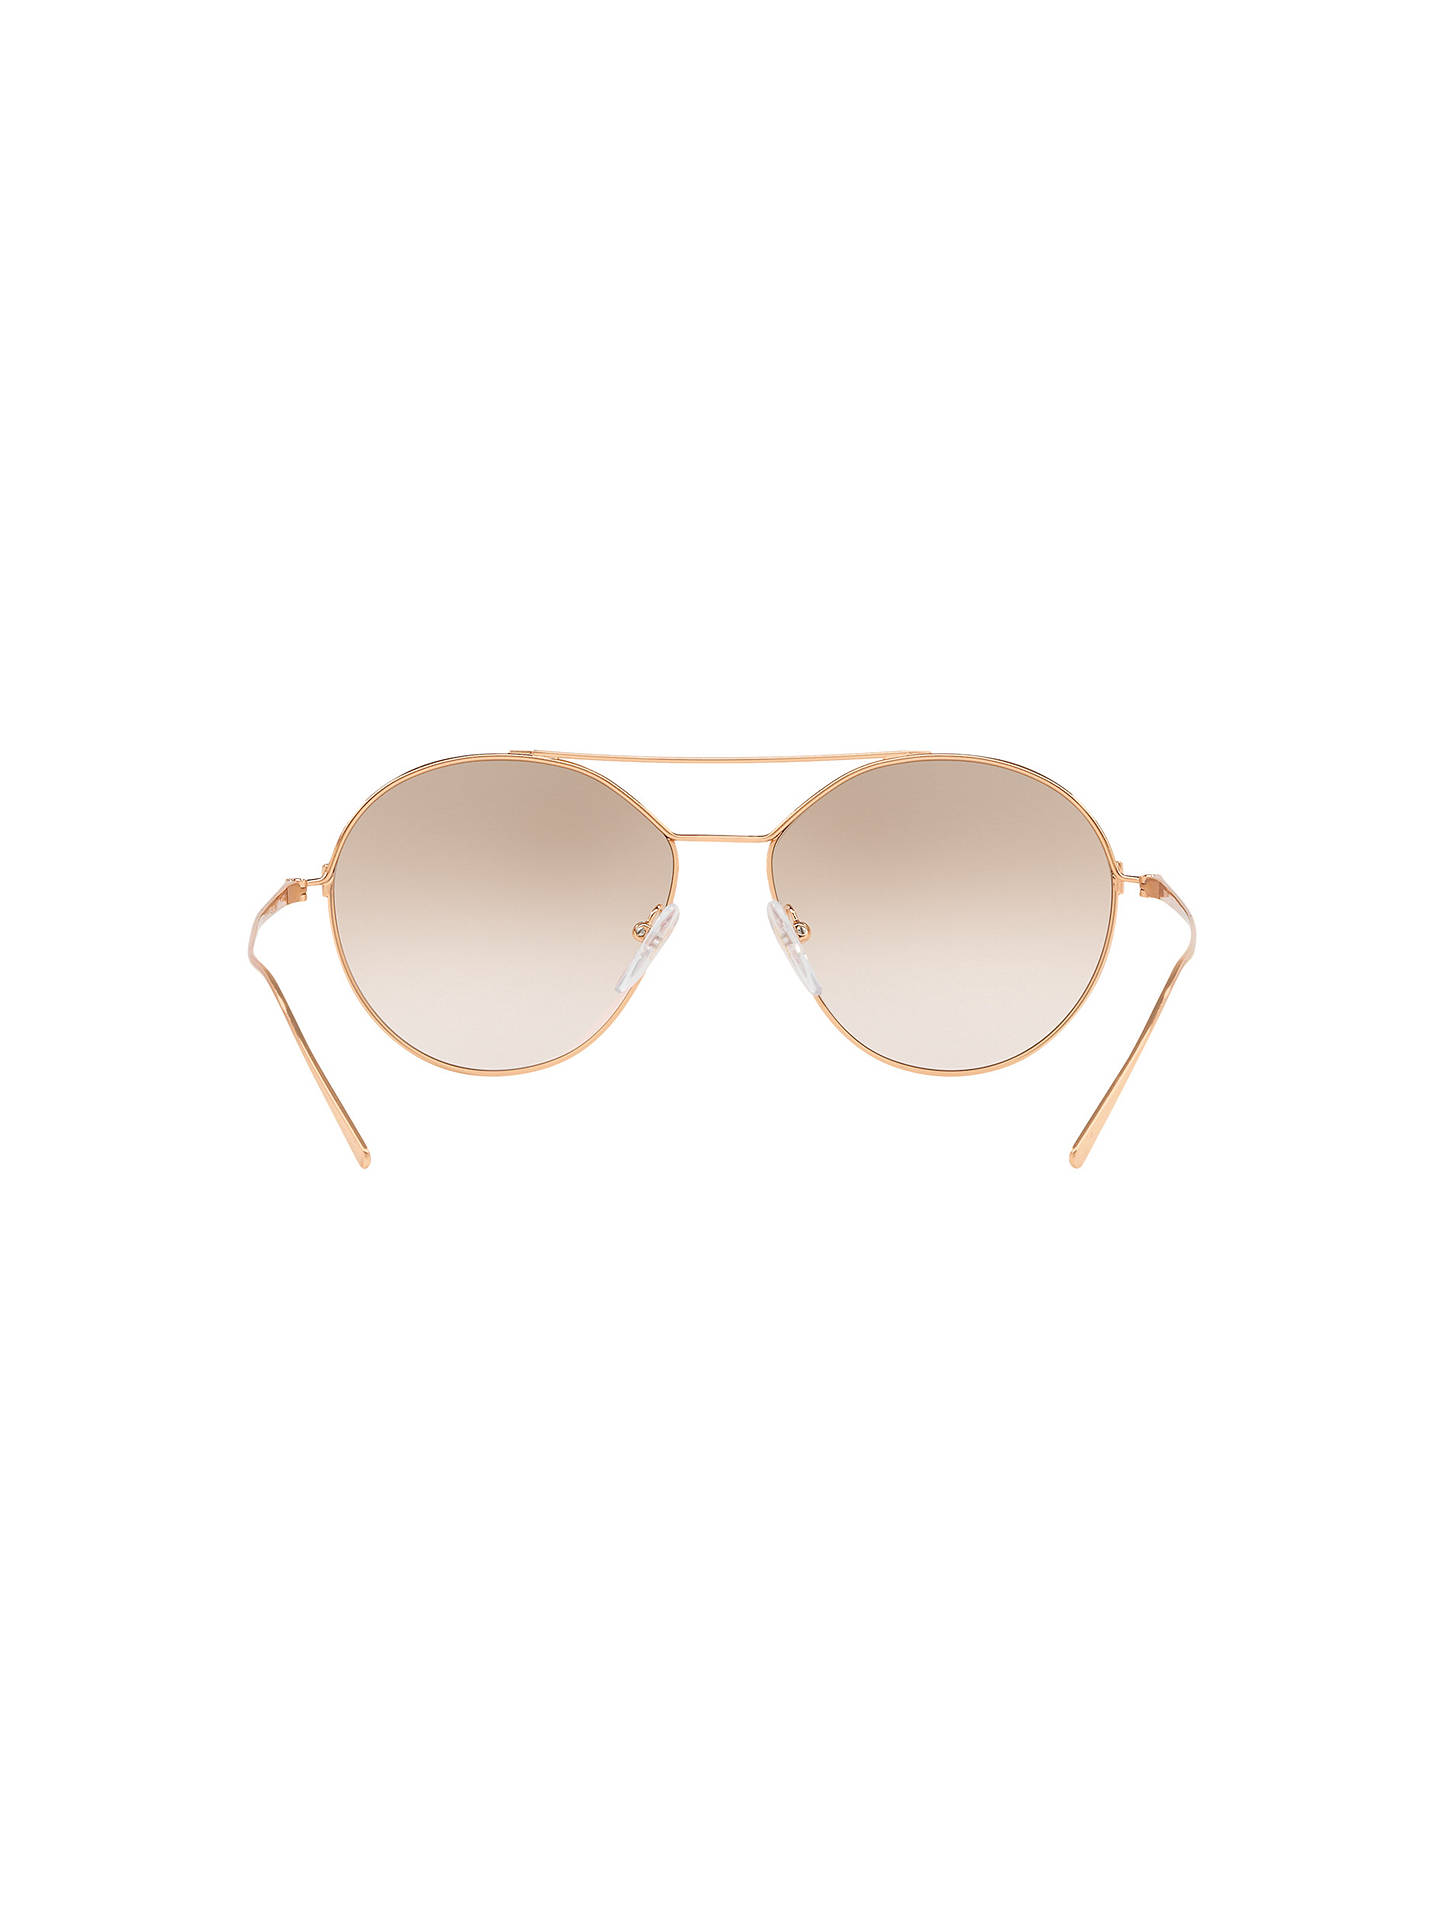 840f07780d72d ... Buy Prada 56US Women s Geometric Sunglasses